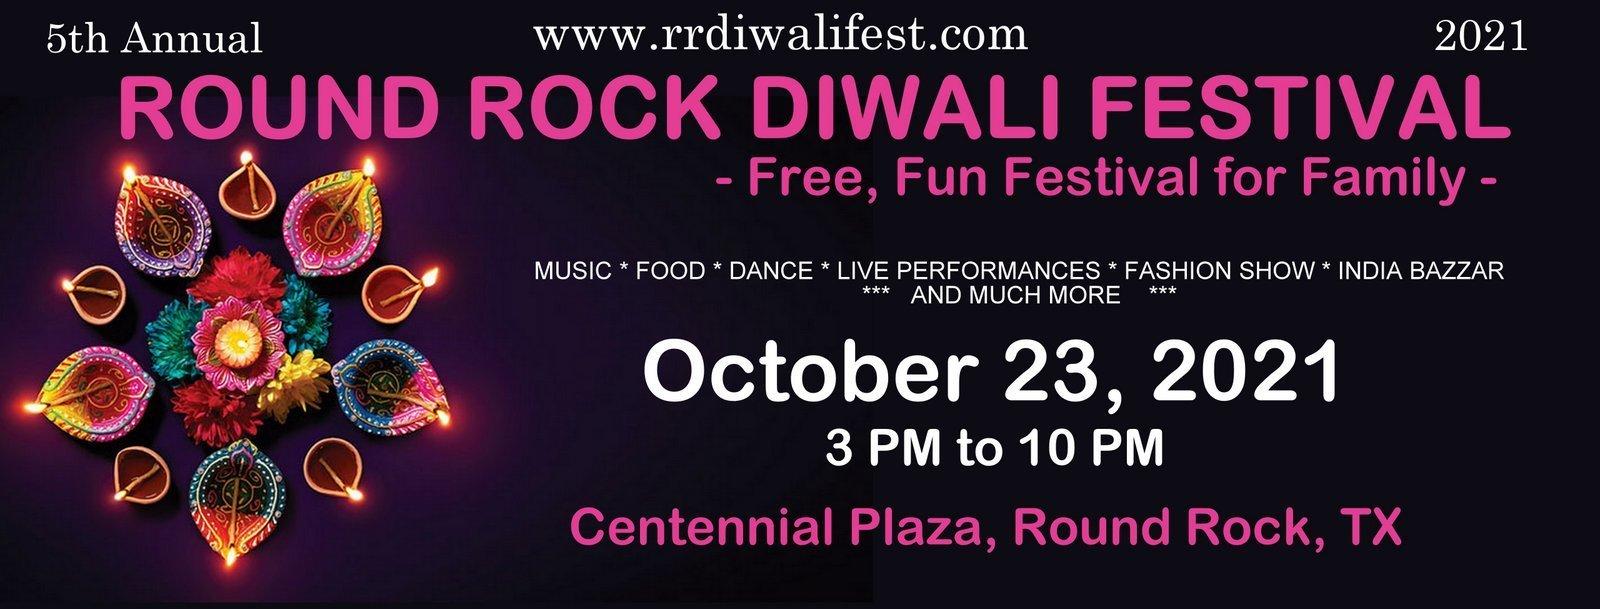 Round Rock Diwali Festival - Festival of Lights in Austin